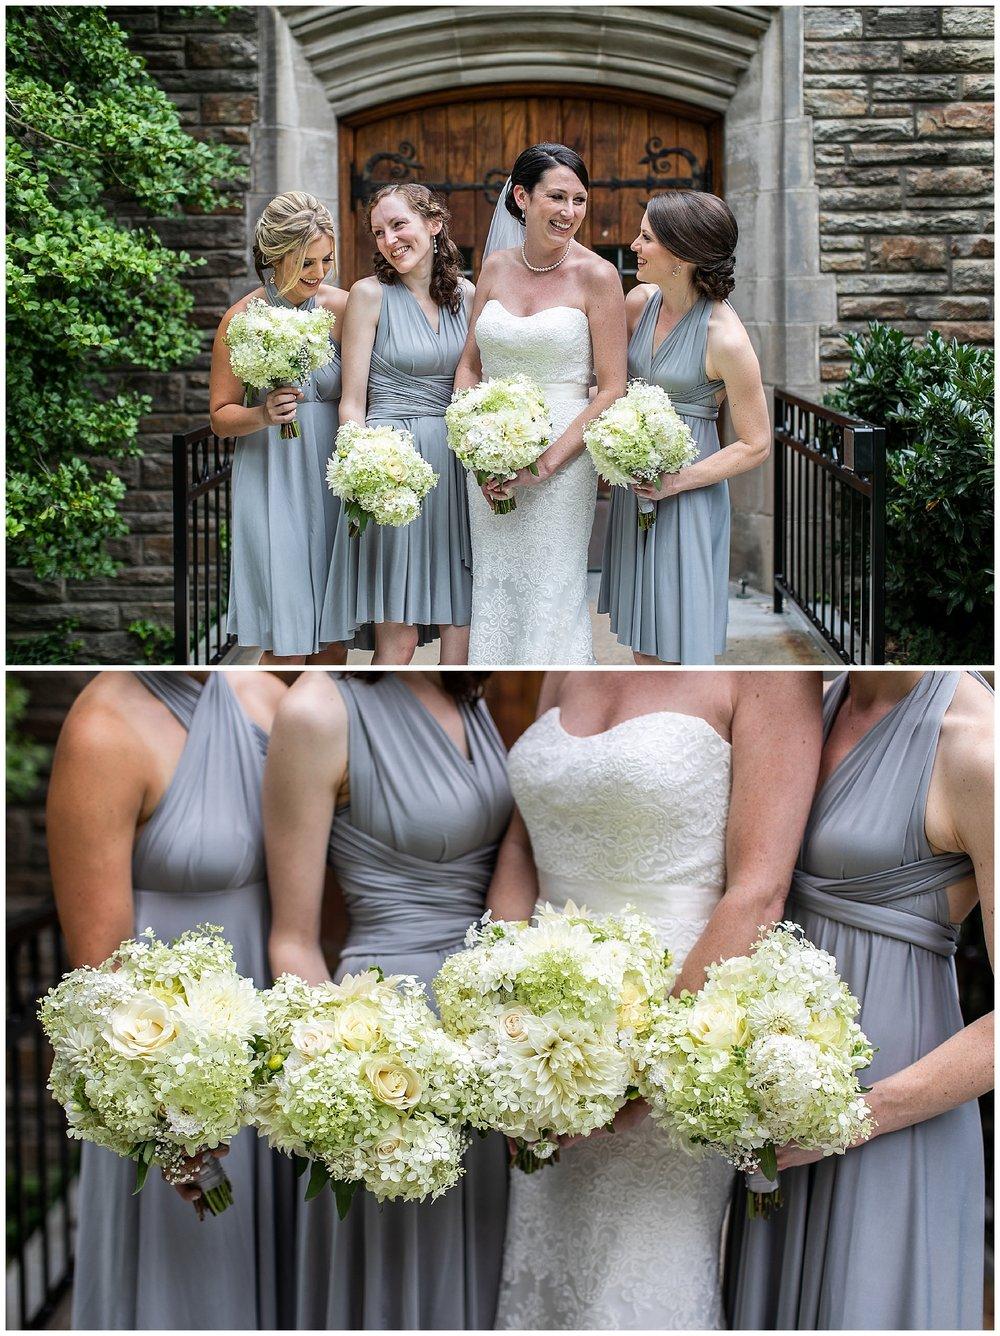 TracyPatrick-LoyolaCollege-PrestonHall-Wedding-LivingRadiantPhotography-photos_0057.jpg